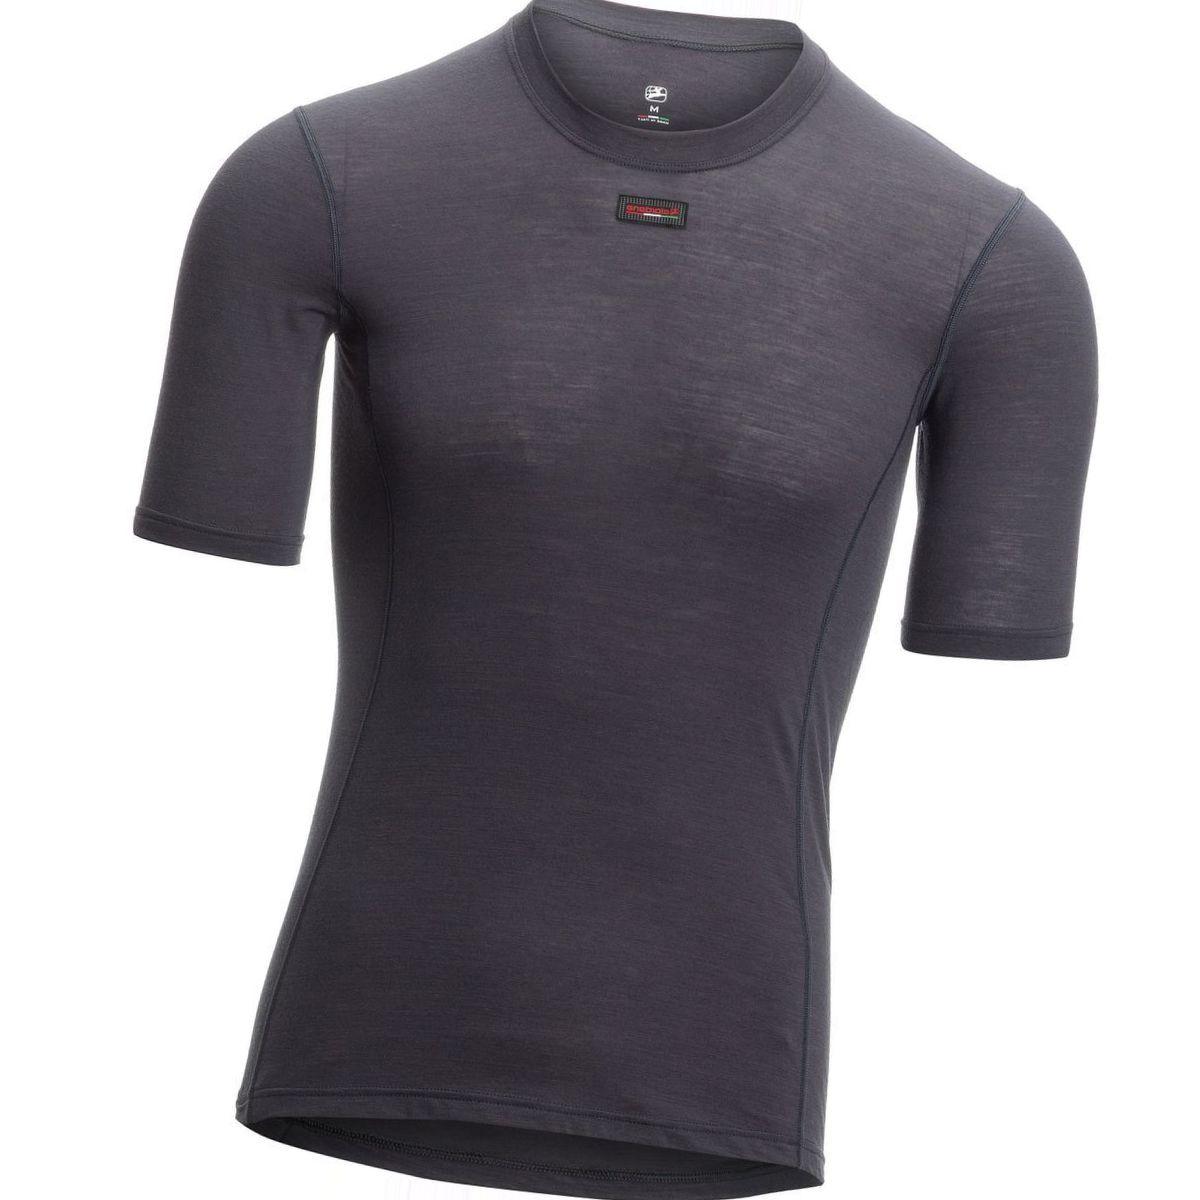 Giordana Wool Blend Short-Sleeve Baselayer - Men's